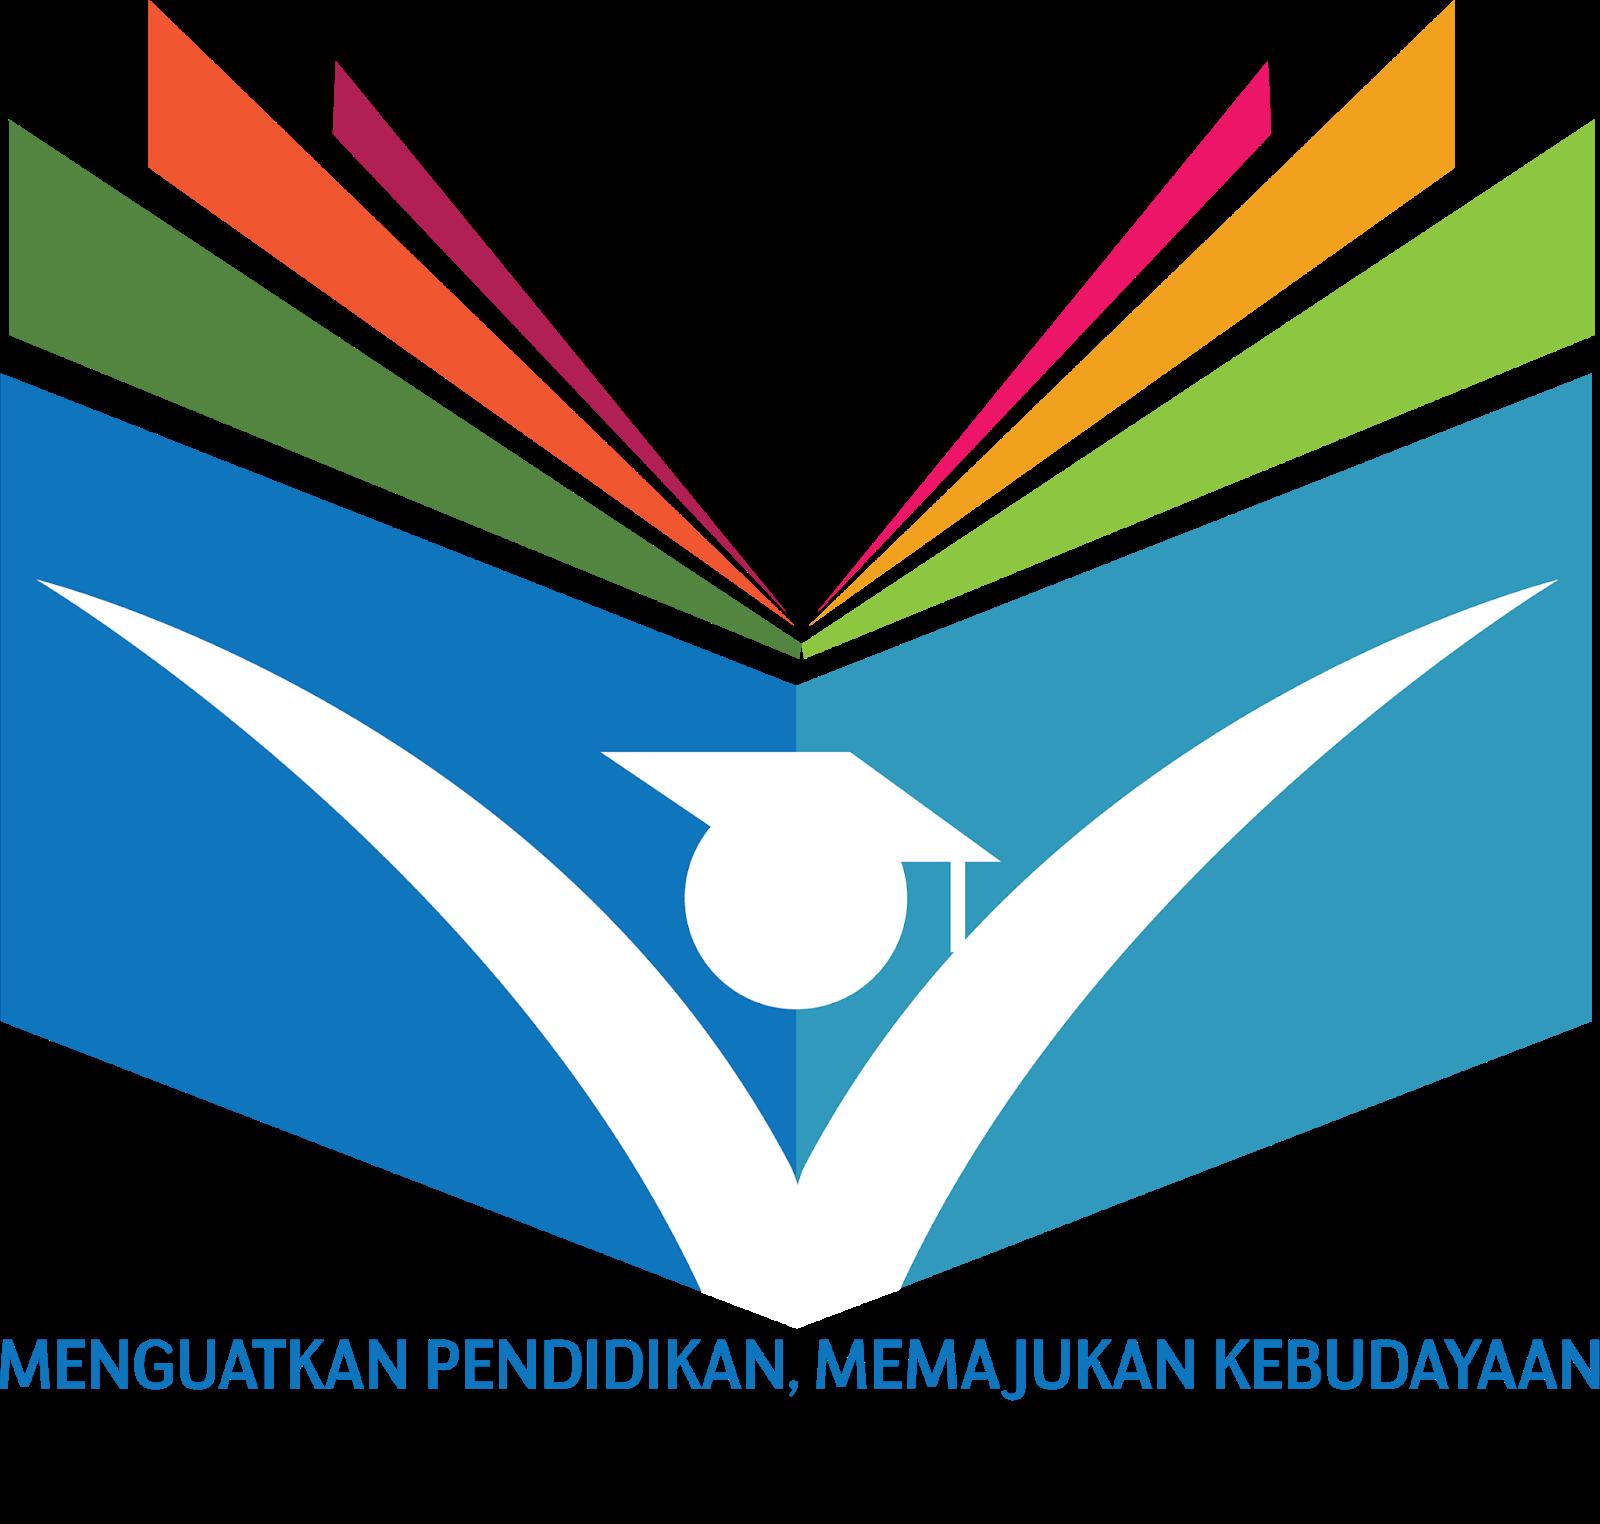 Logo Dan Tema Peringatan Hari Pendidikan Nasional Tahun 2018 Dadang Jsn